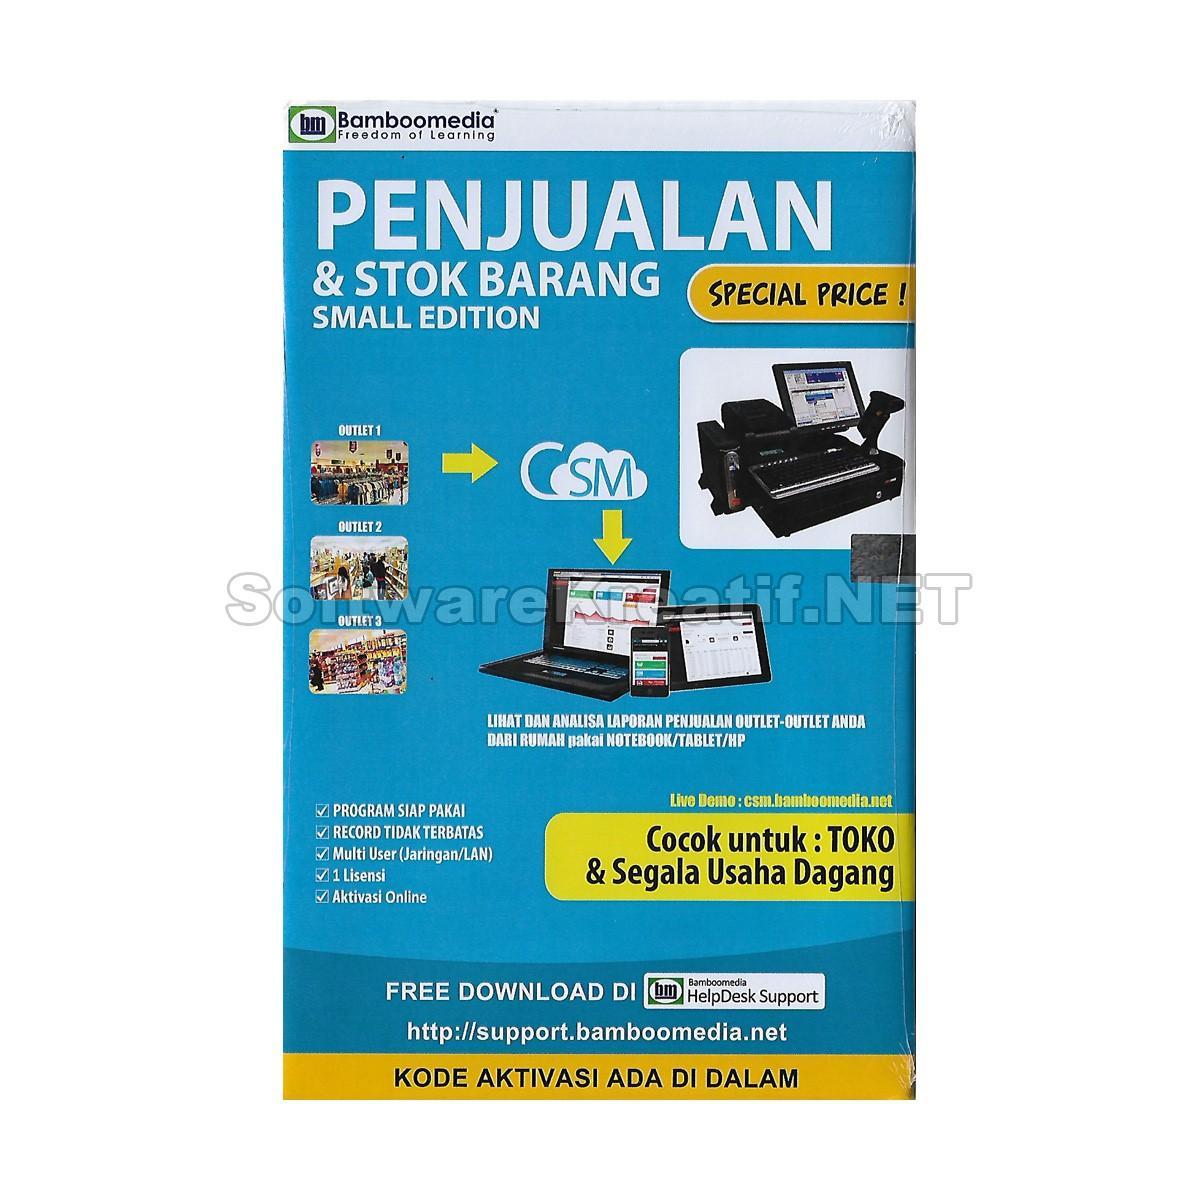 Bamboomedia Program Penjualan Dan Stok Barang Small Edition - Software Untuk Toko Dan Segala Usaha Dagang